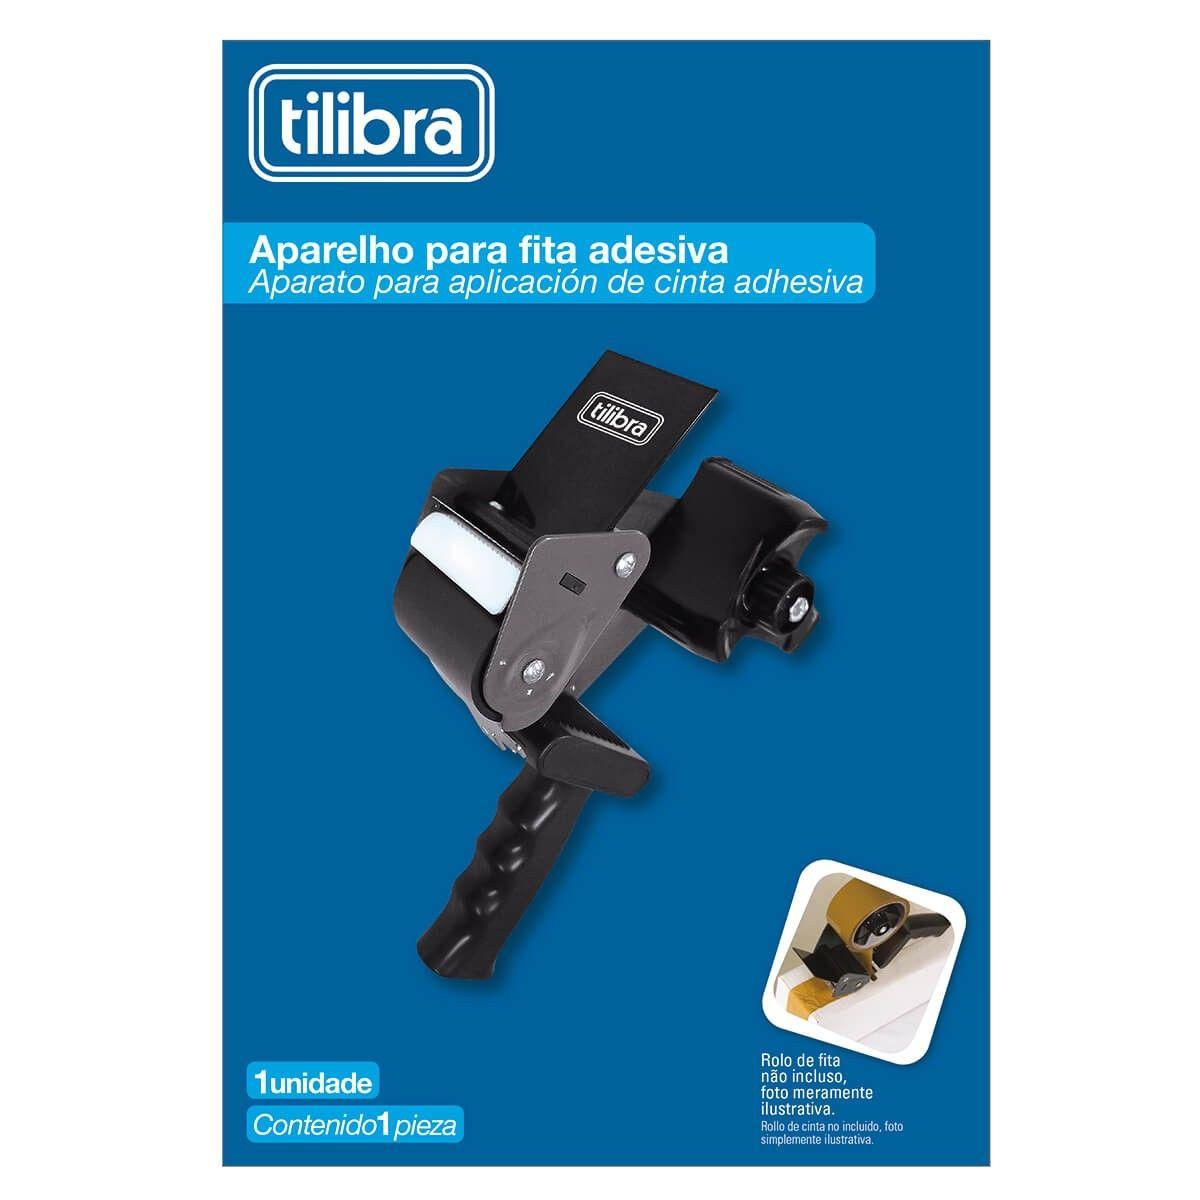 Aplicador para Fita Adesiva Para Embalagens - Tilibra